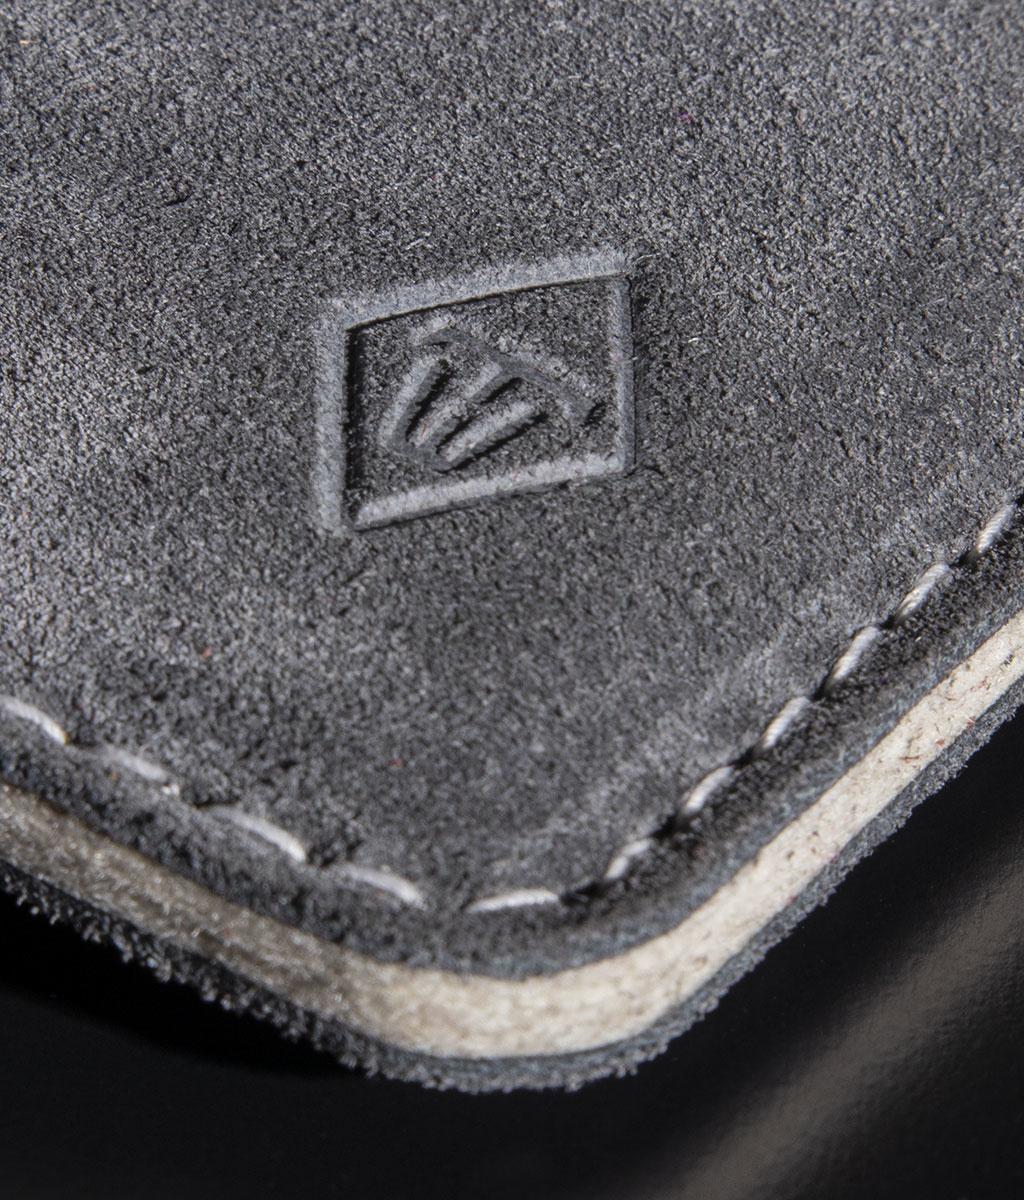 iPhone 12 11 Pro Max mini SE XR 8 suede leather sleeve, case SCHUTZMASSNAHME